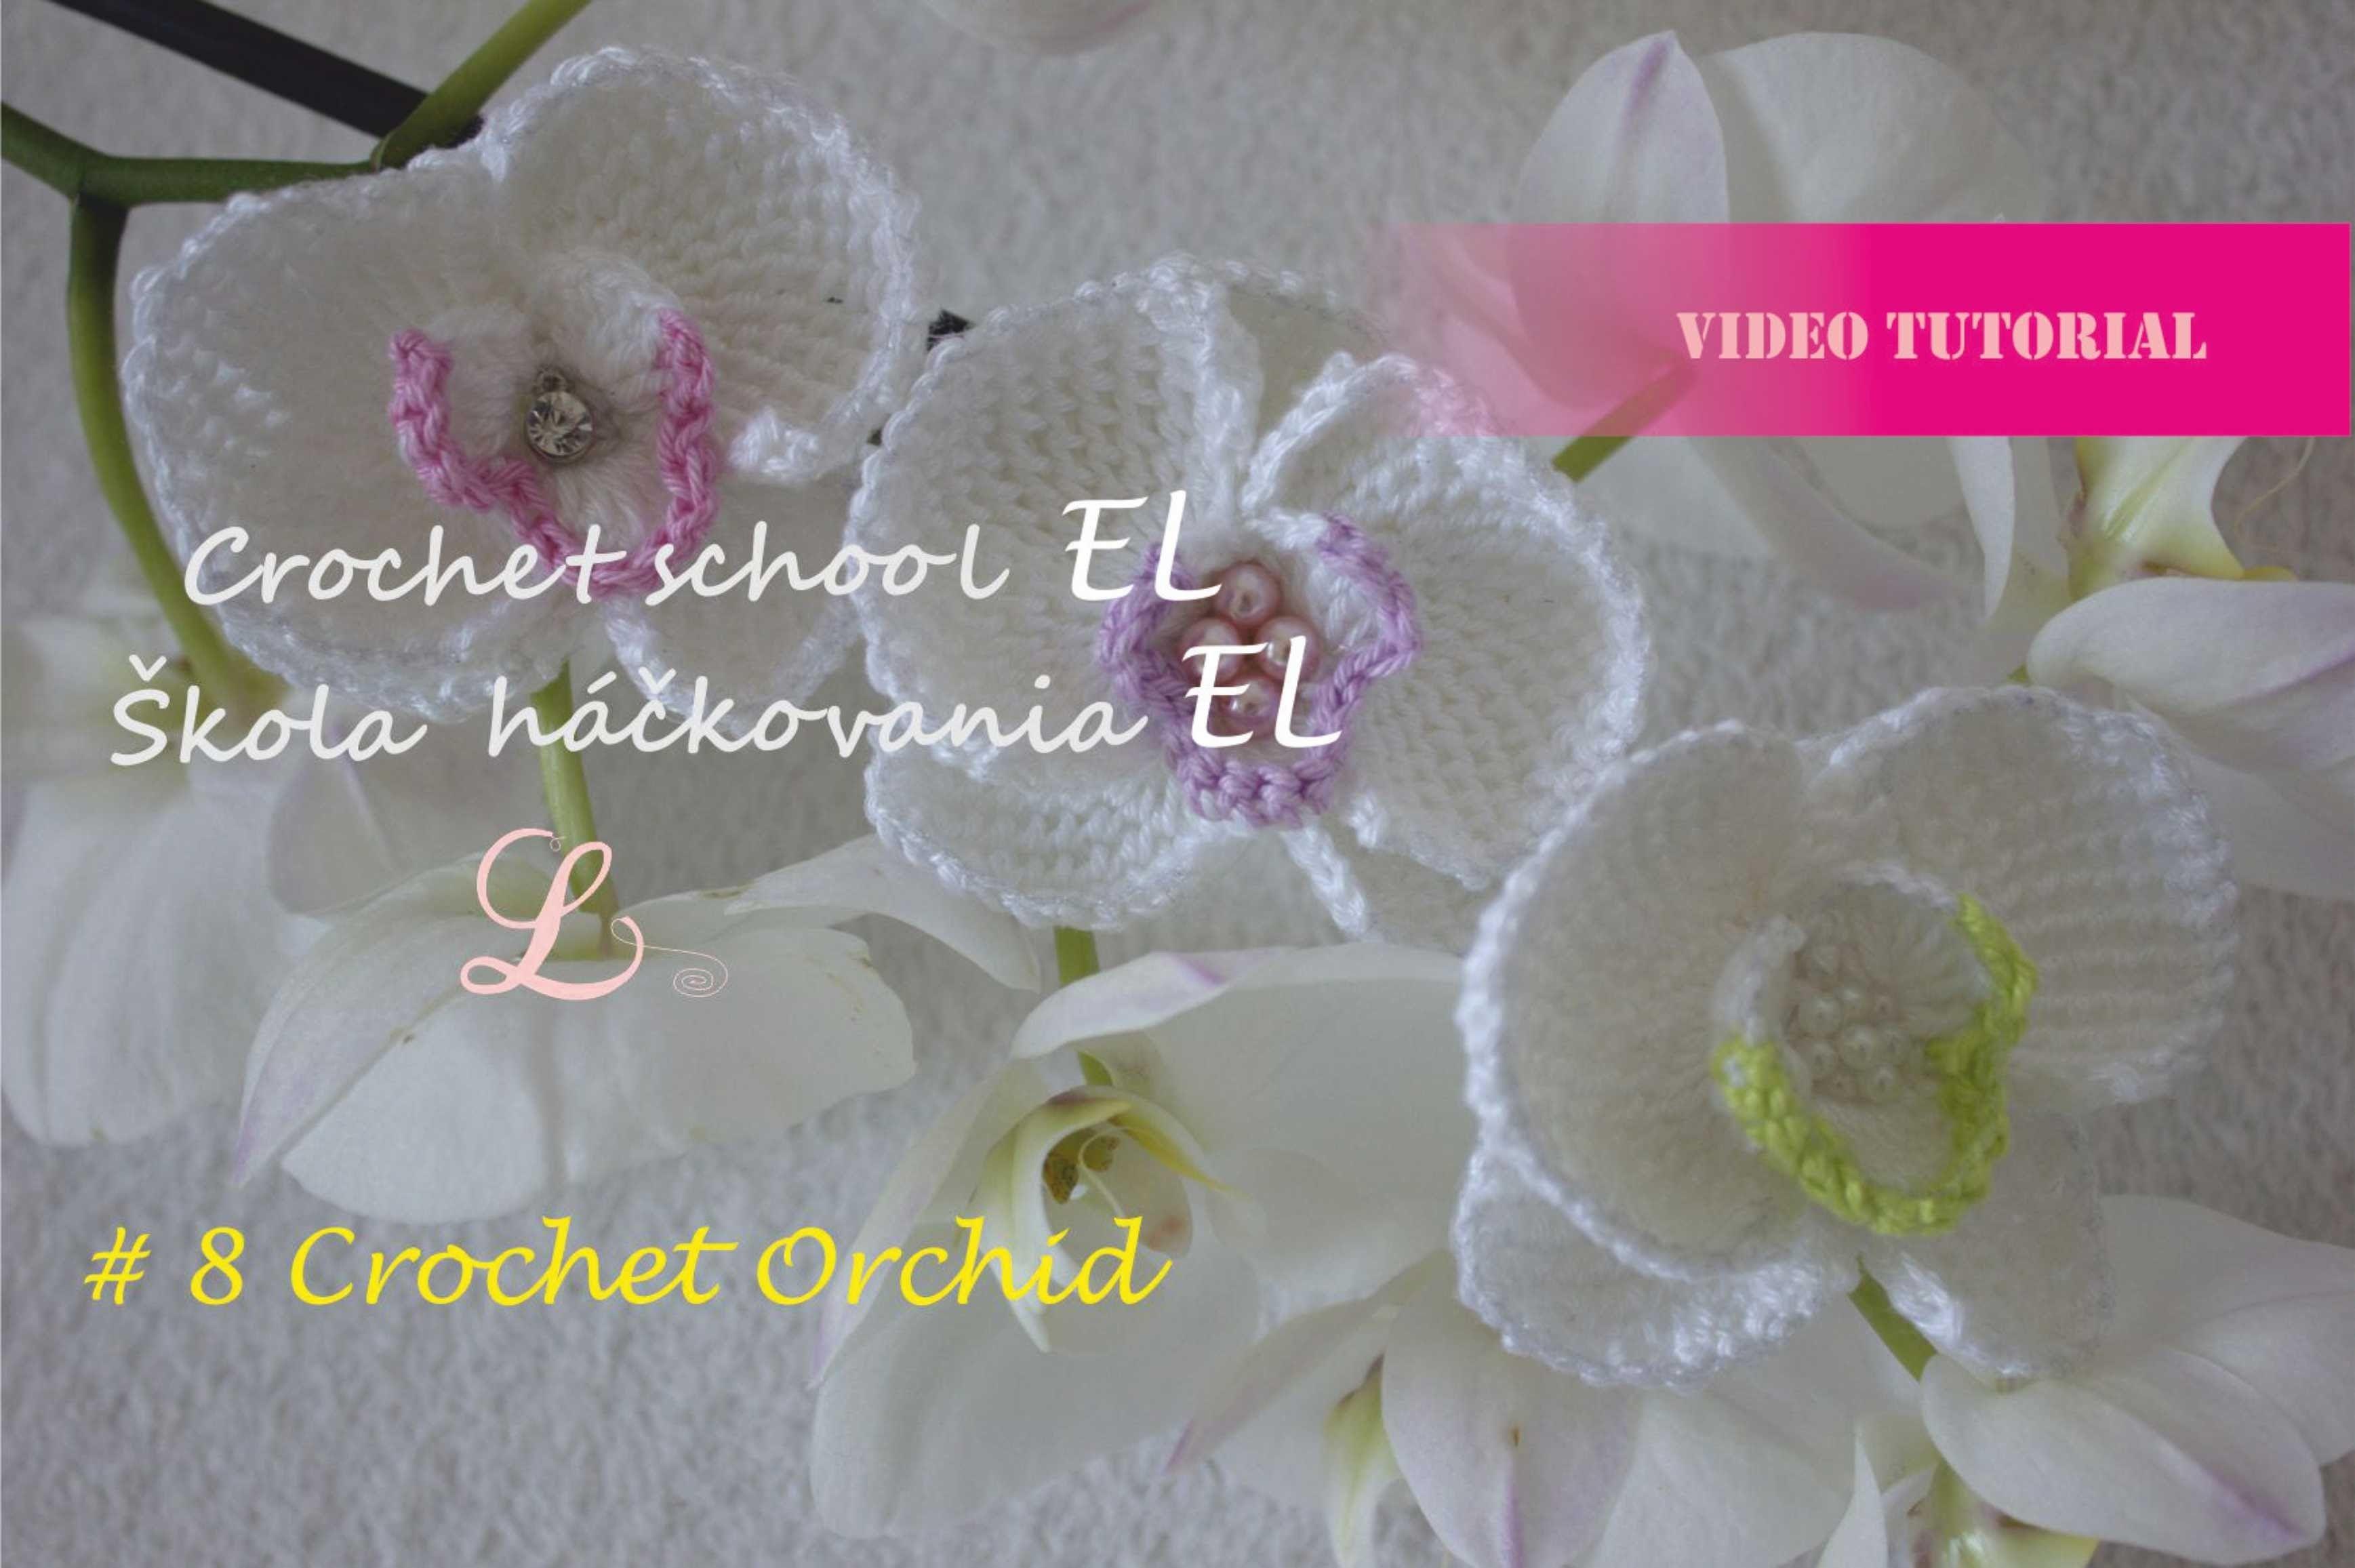 Crochet school EL, #8 Crochet Orchid   Lilien und Häkeln